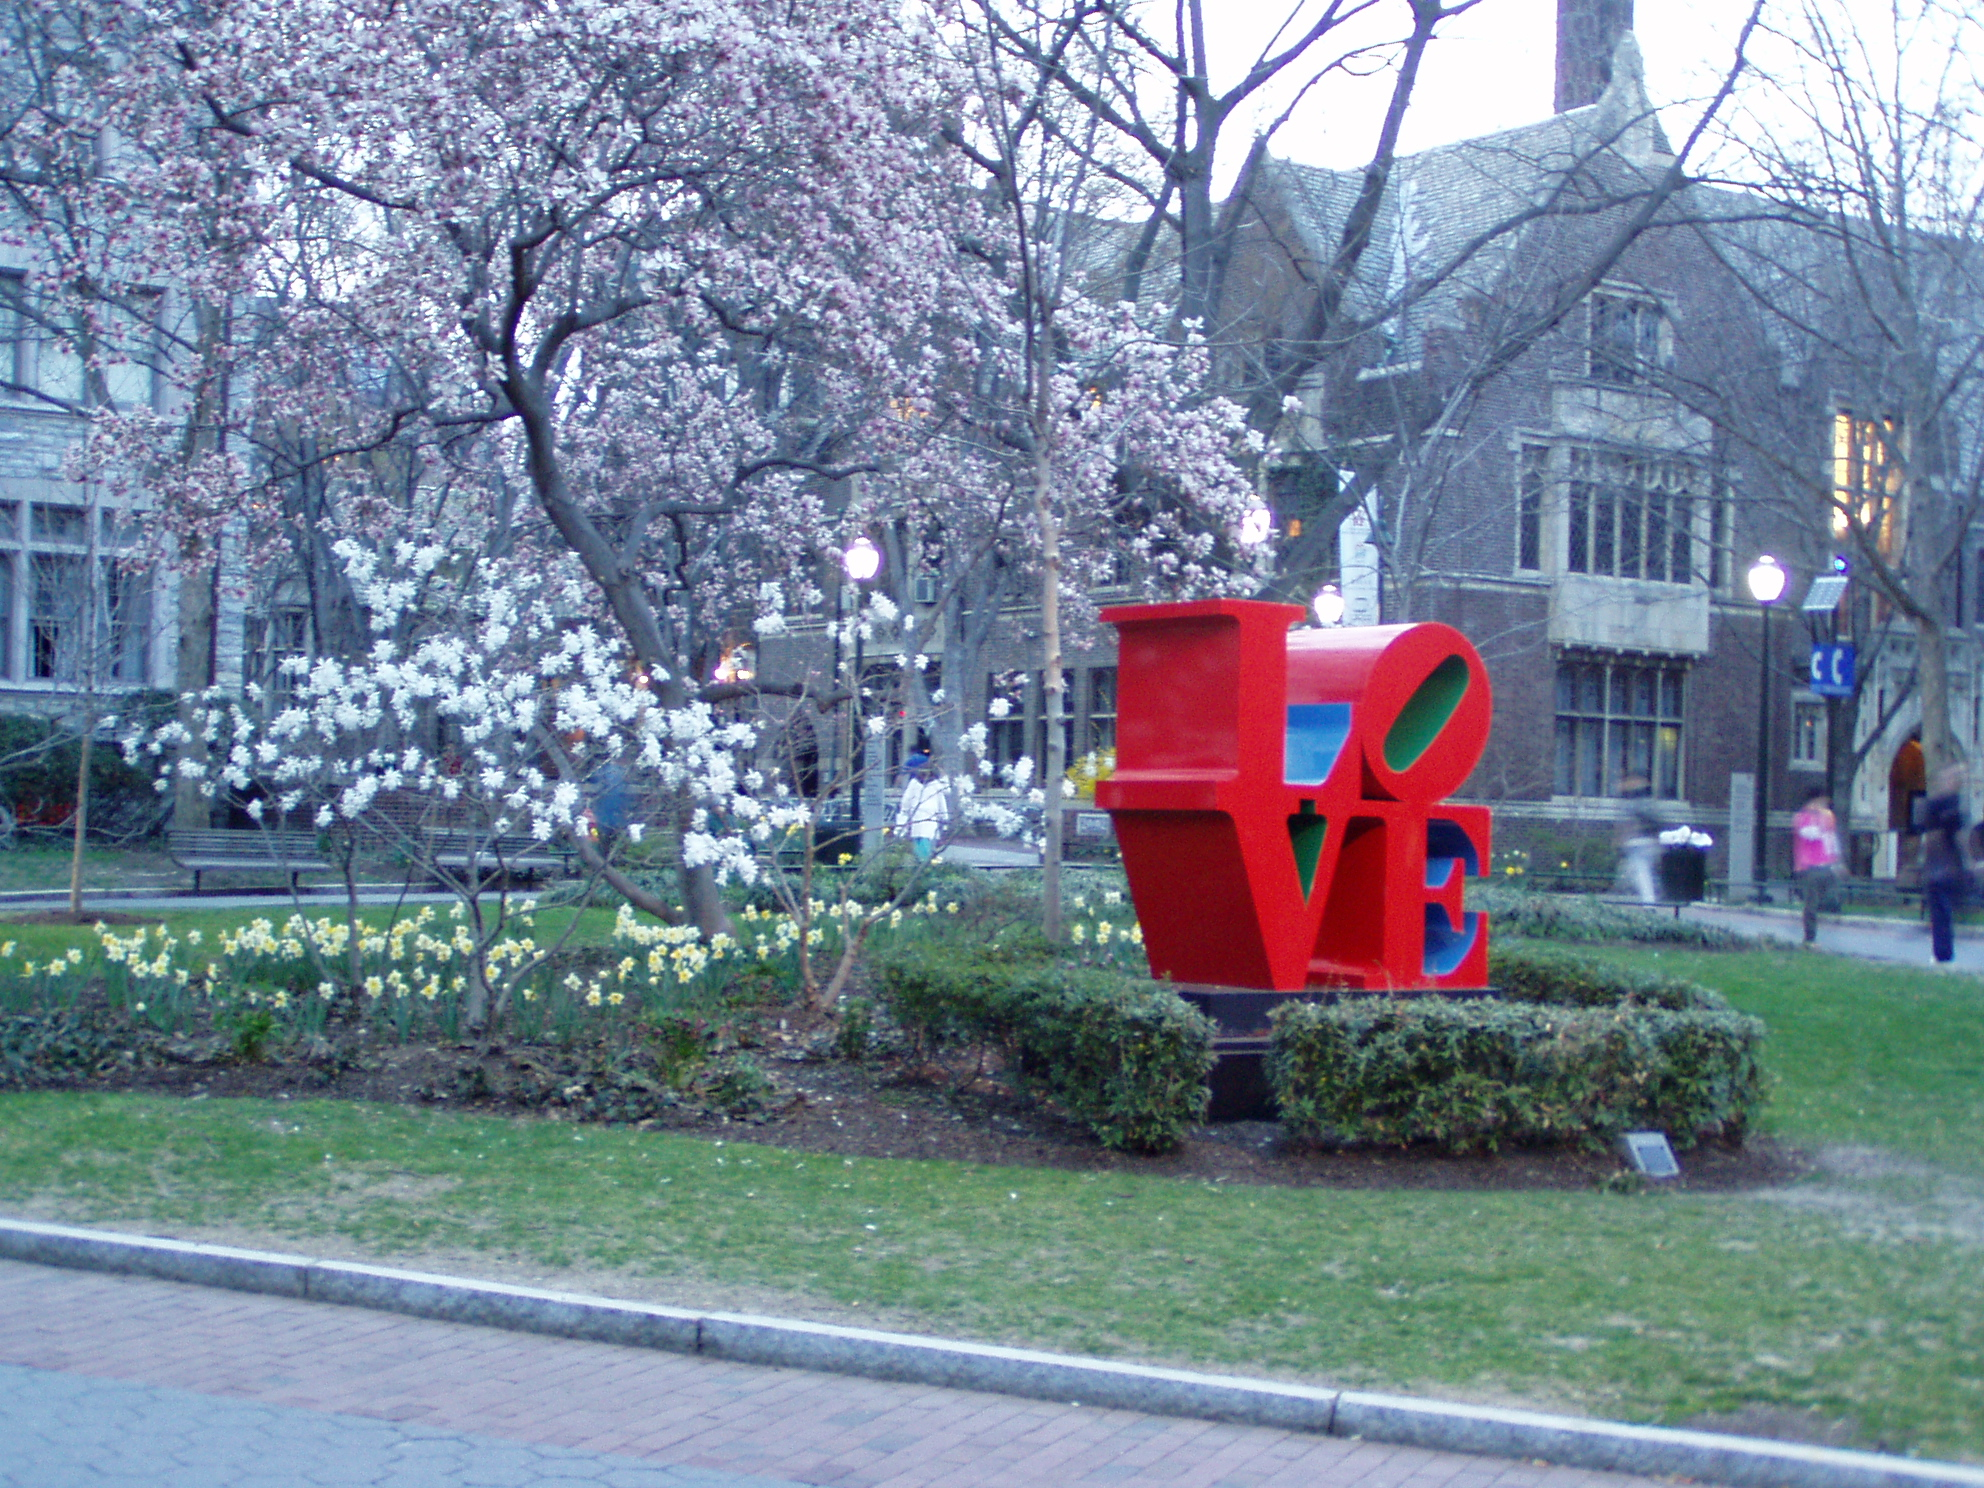 LOVE sculpture at Penn by Jeffrey M. Vinocur